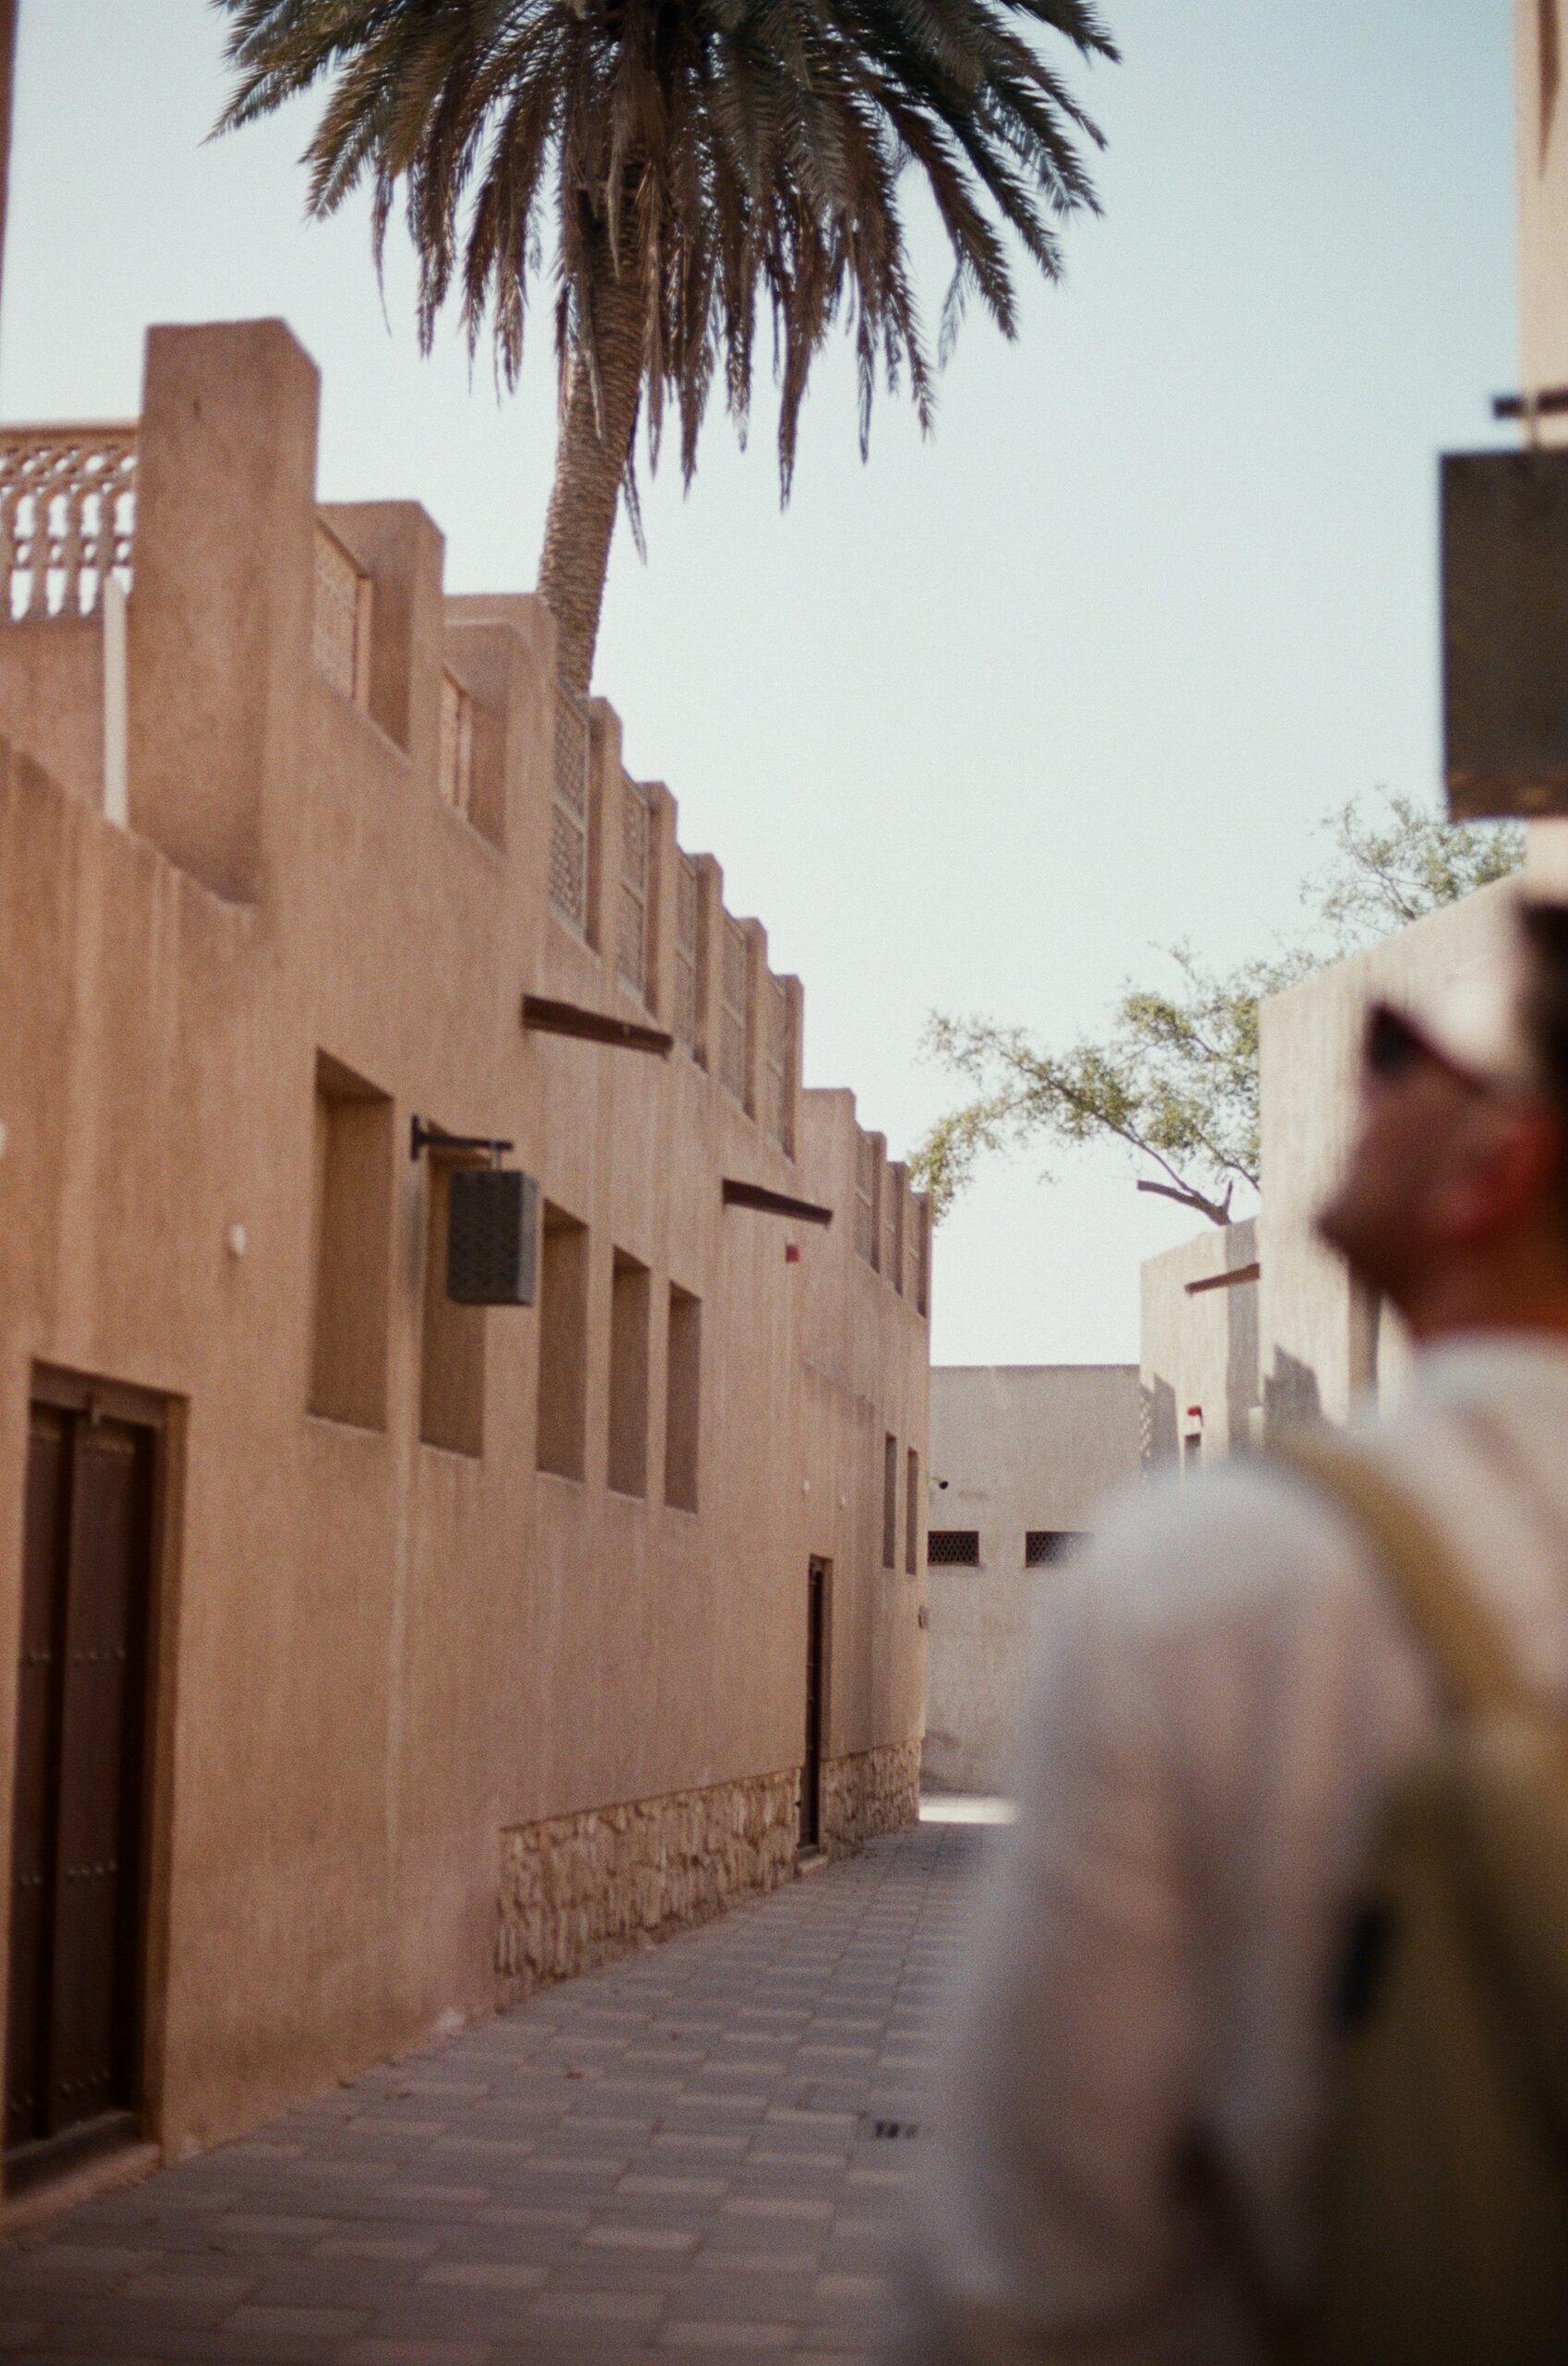 Al Shindagha neighbourhood and museum in Dubai